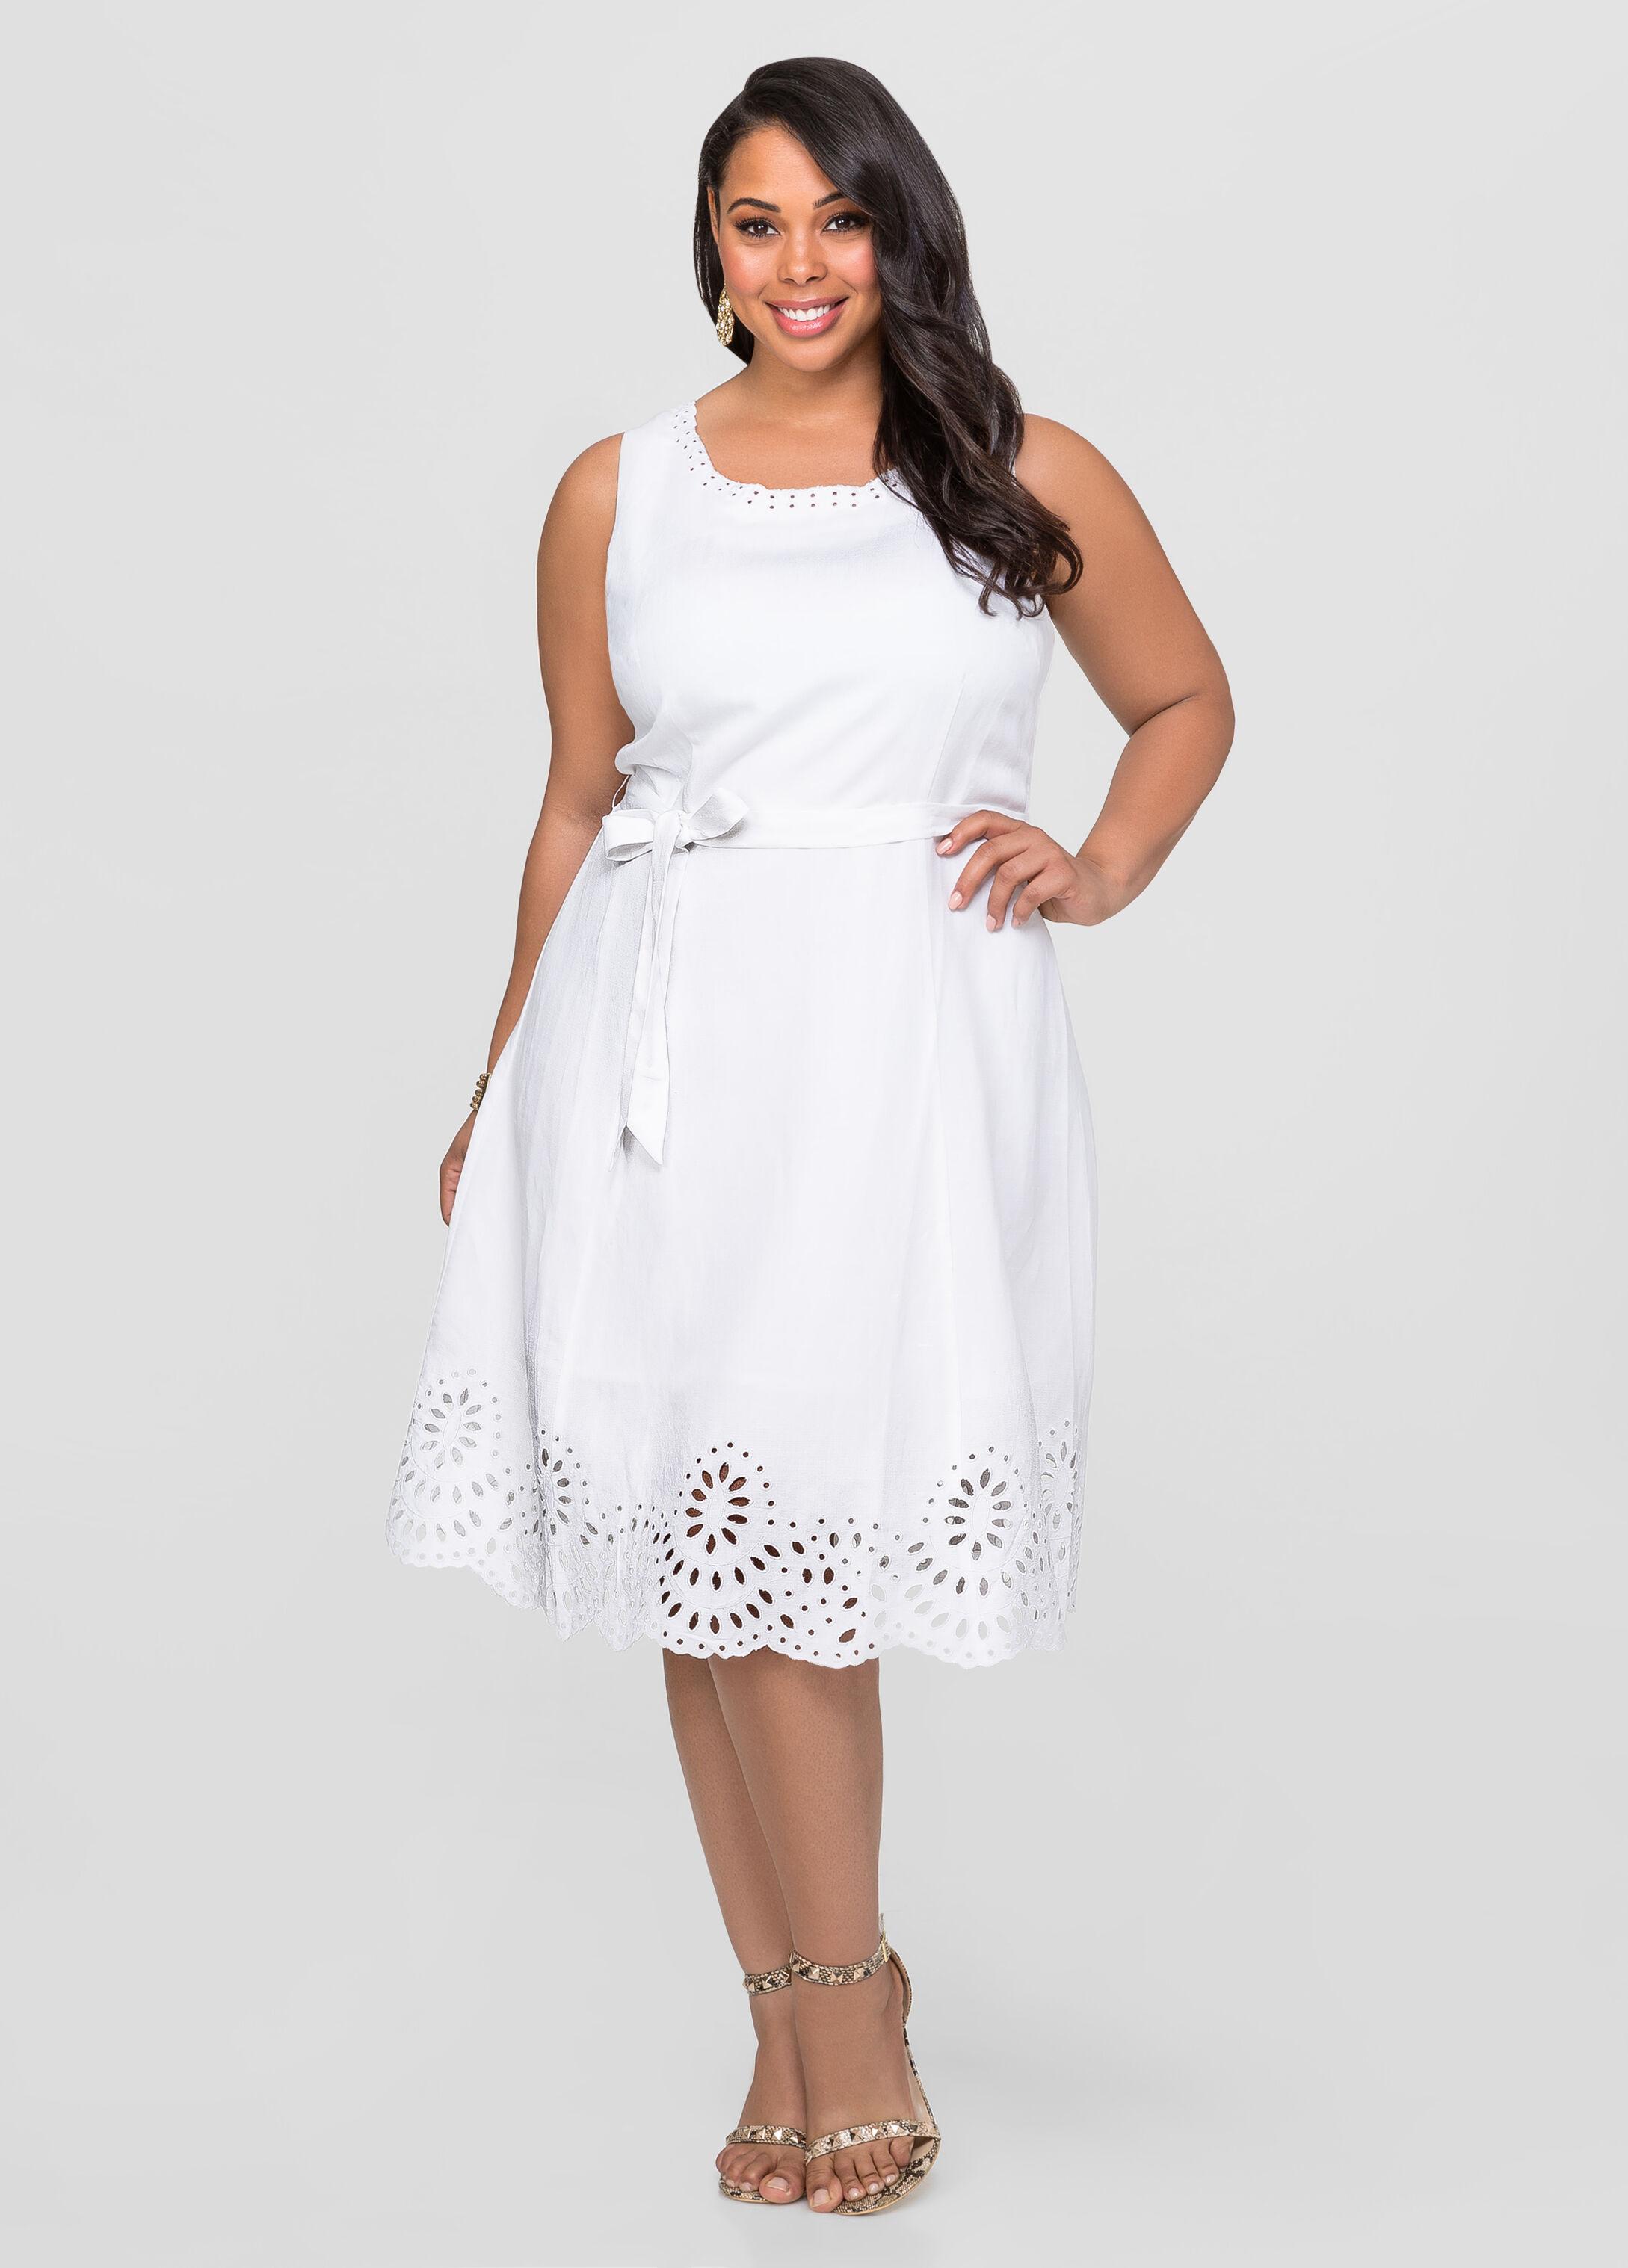 Linen Eyelet A Line Dress Plus Size Dresses Ashley Stewart